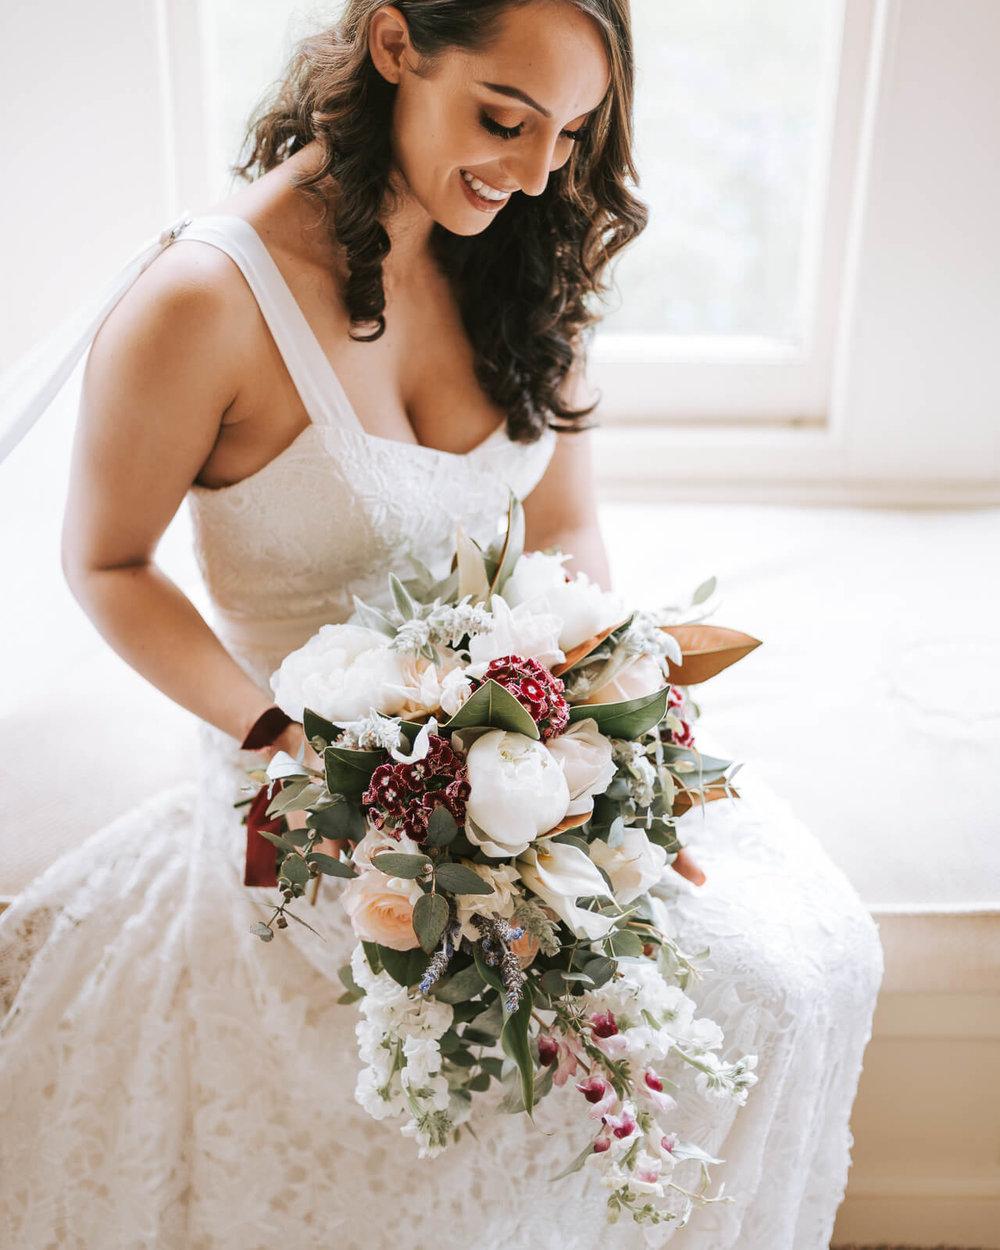 elizabeth may bridal DSC_1311_EmmaSkye.jpg